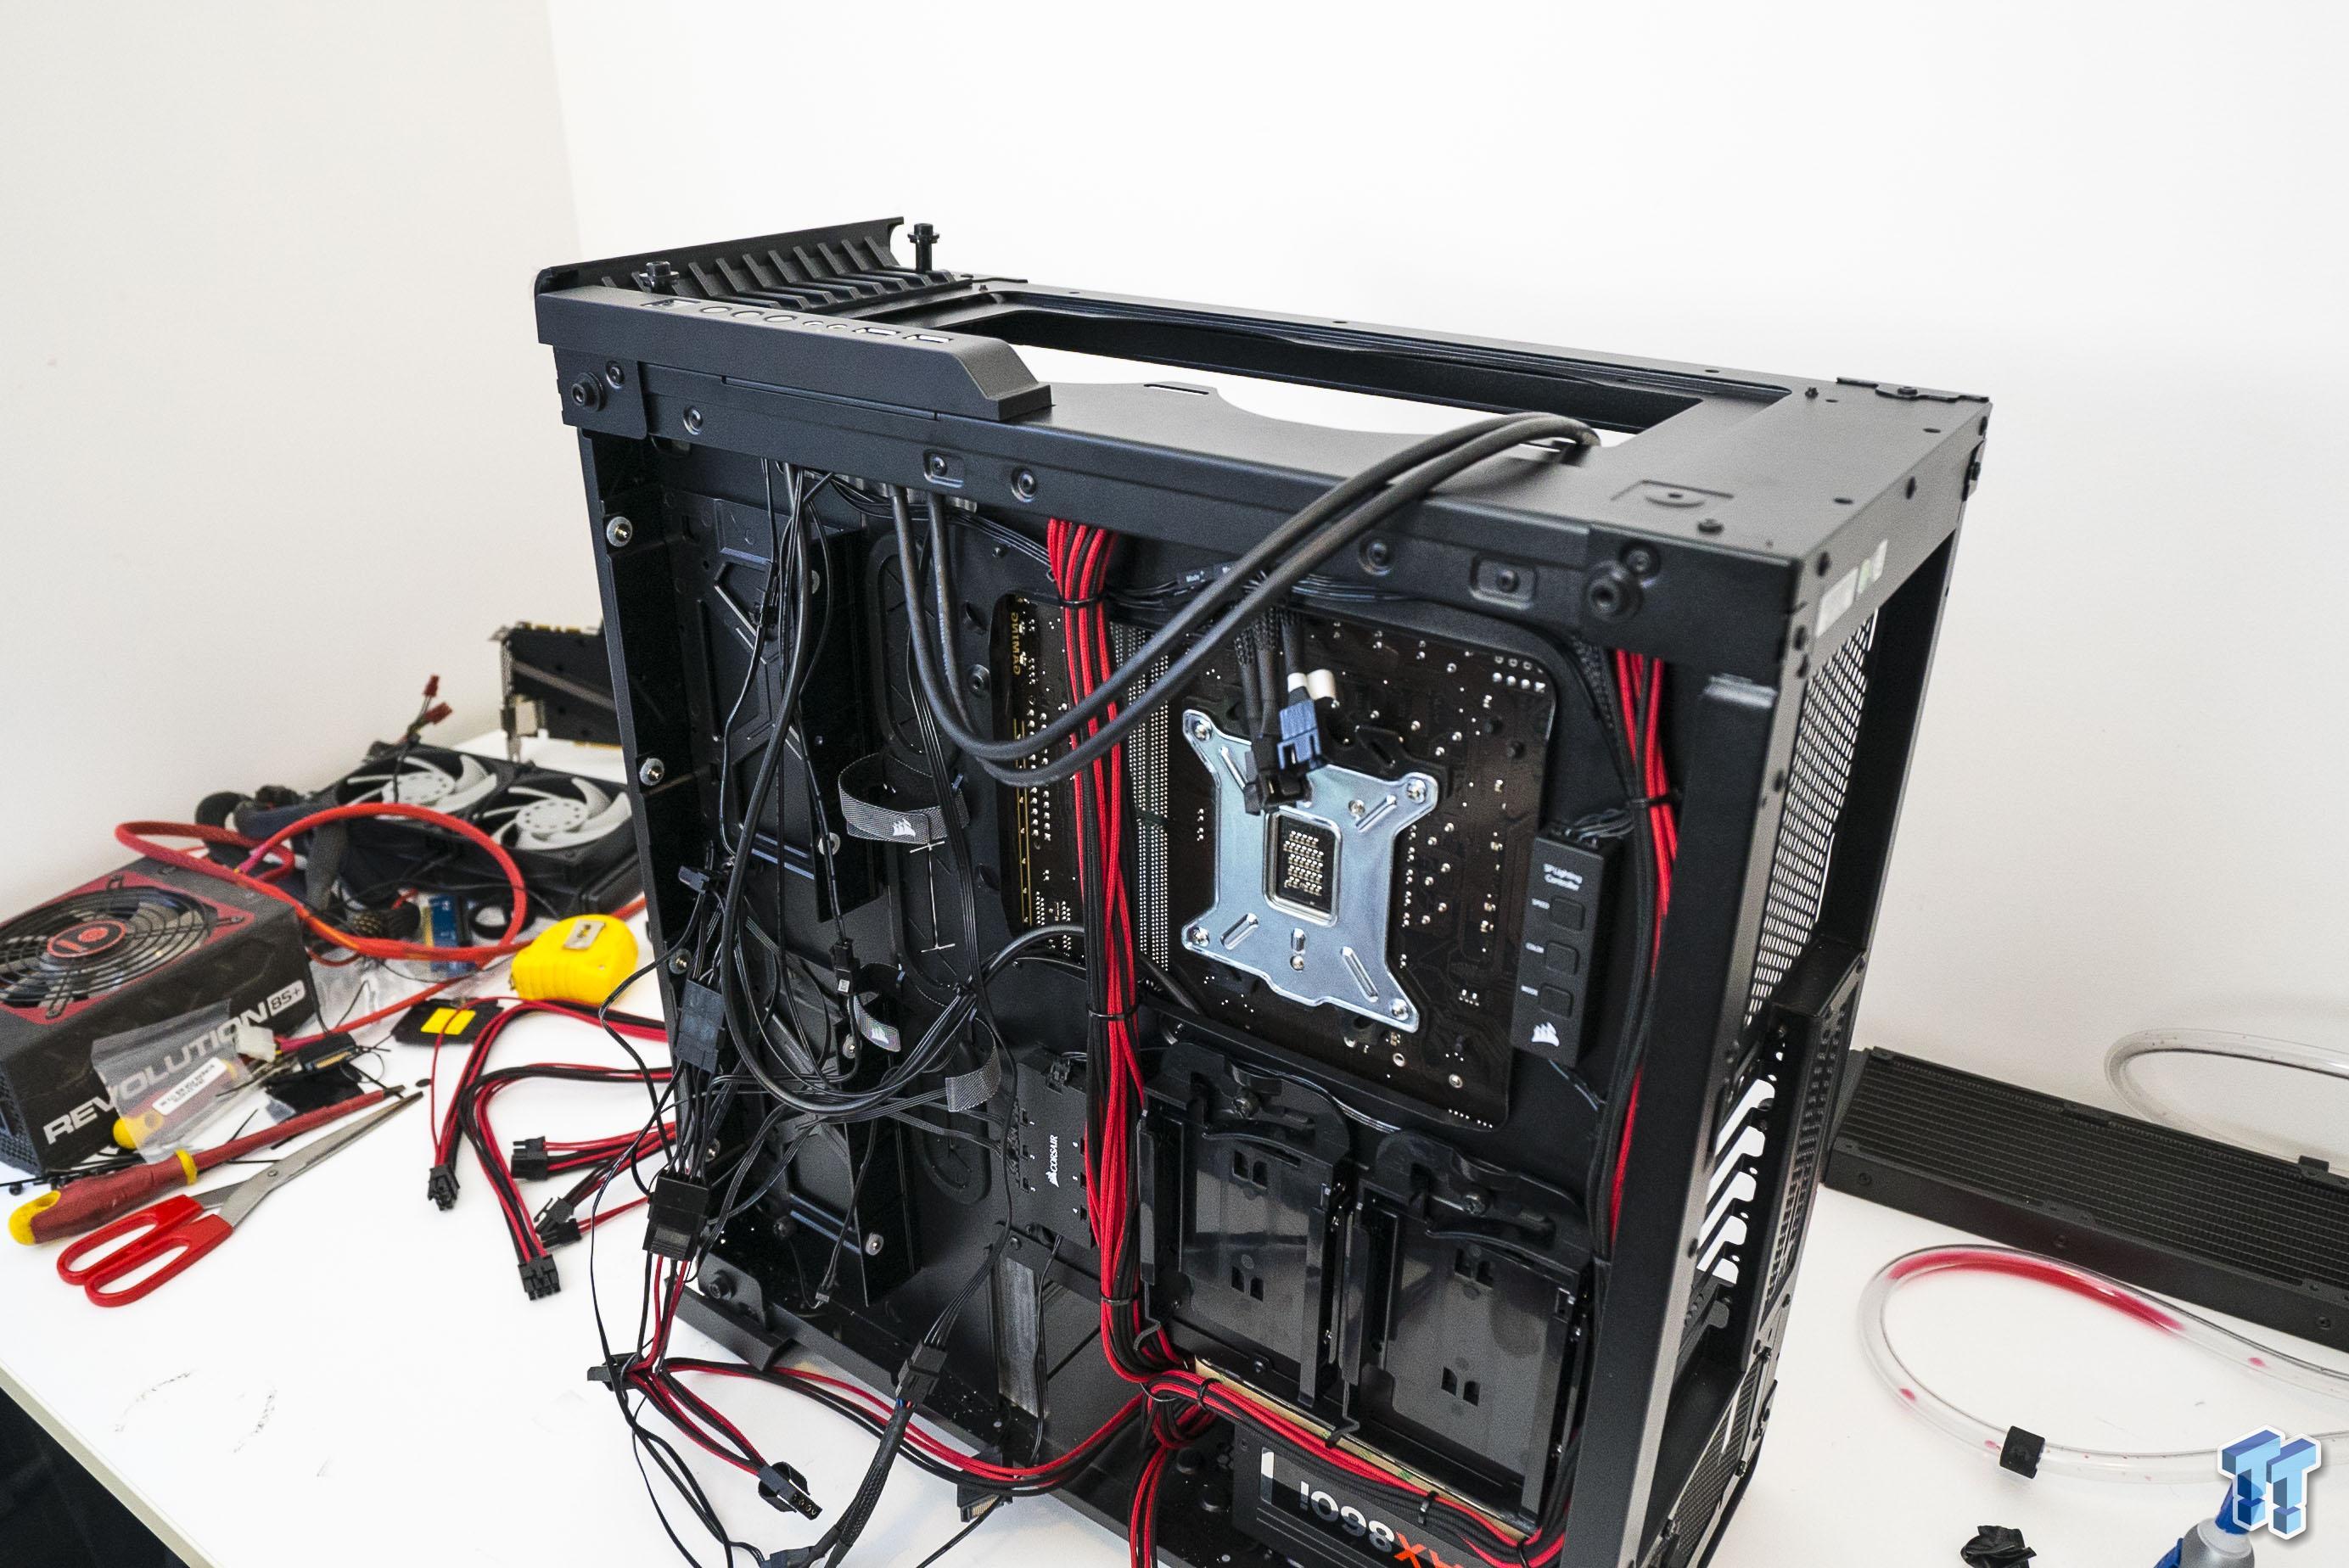 EK Fluid Gaming: Water-Cooled Gaming PC Build Guide